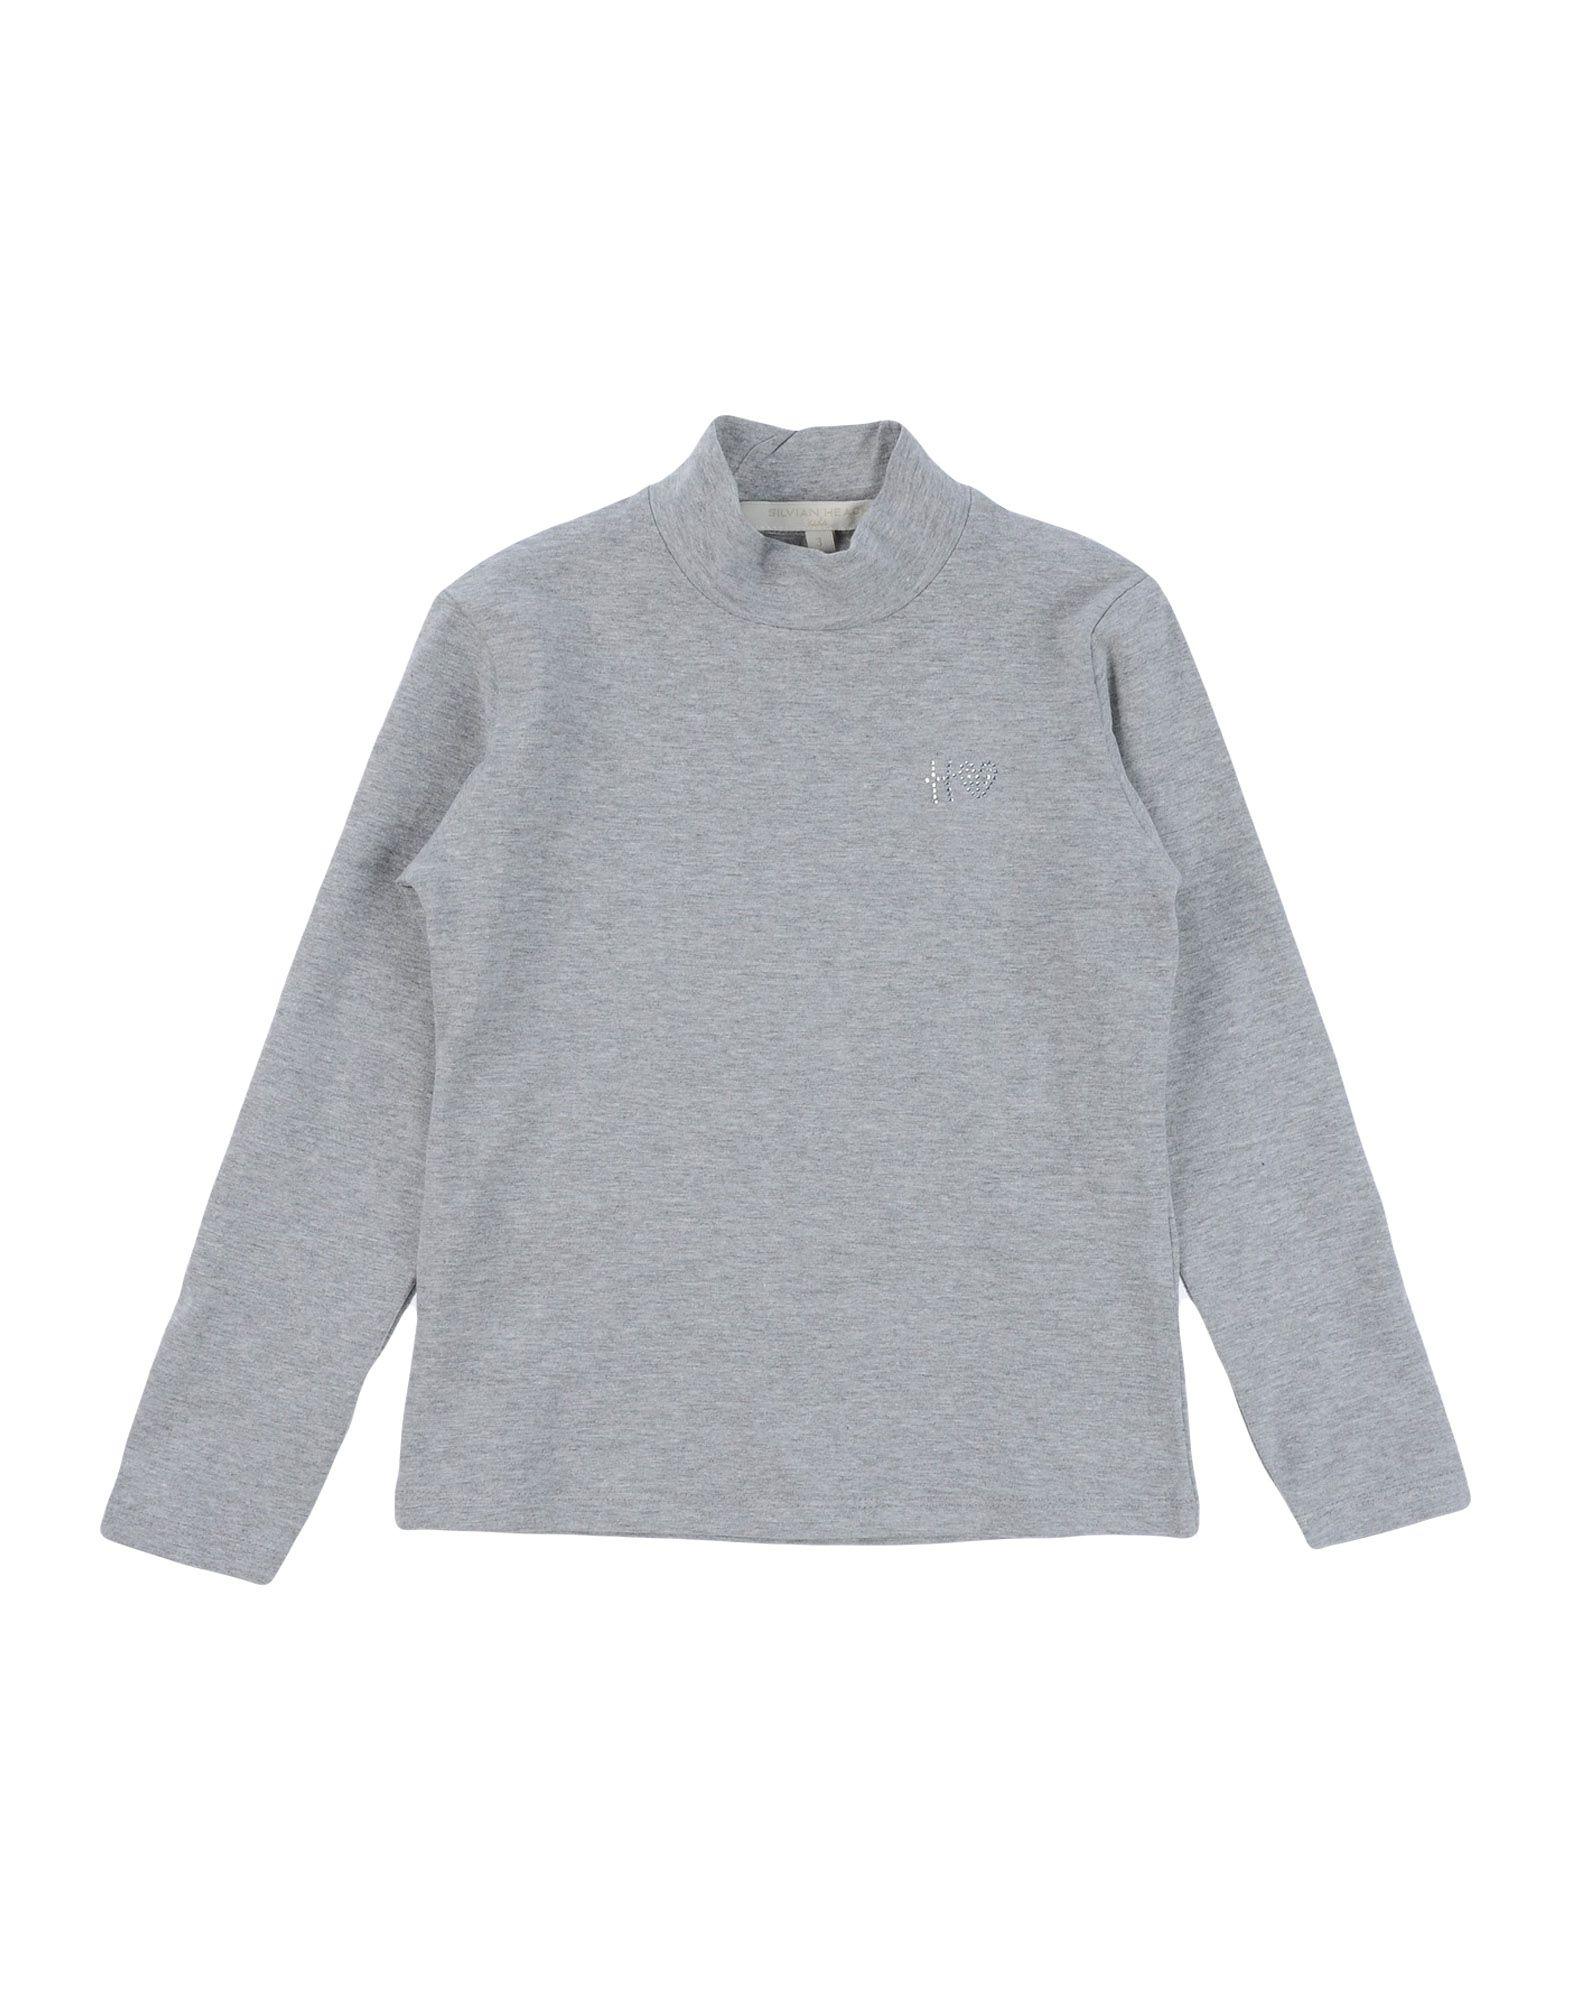 Silvian Heach Kids' T-shirts In Gray